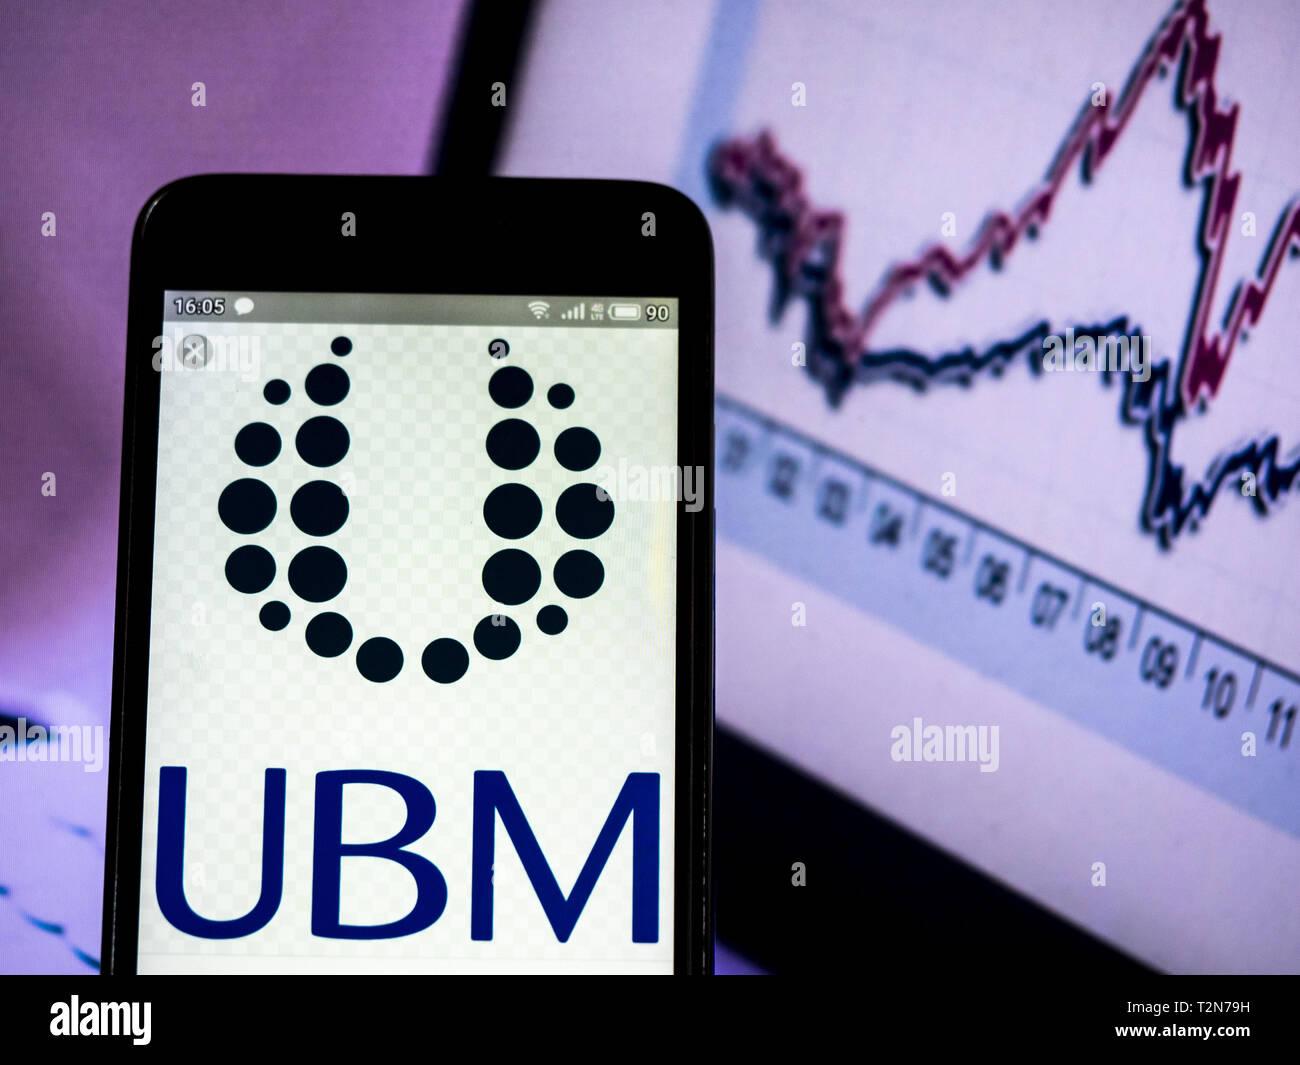 Ukraine  3rd Apr, 2019  In this photo illustration a UBM plc logo